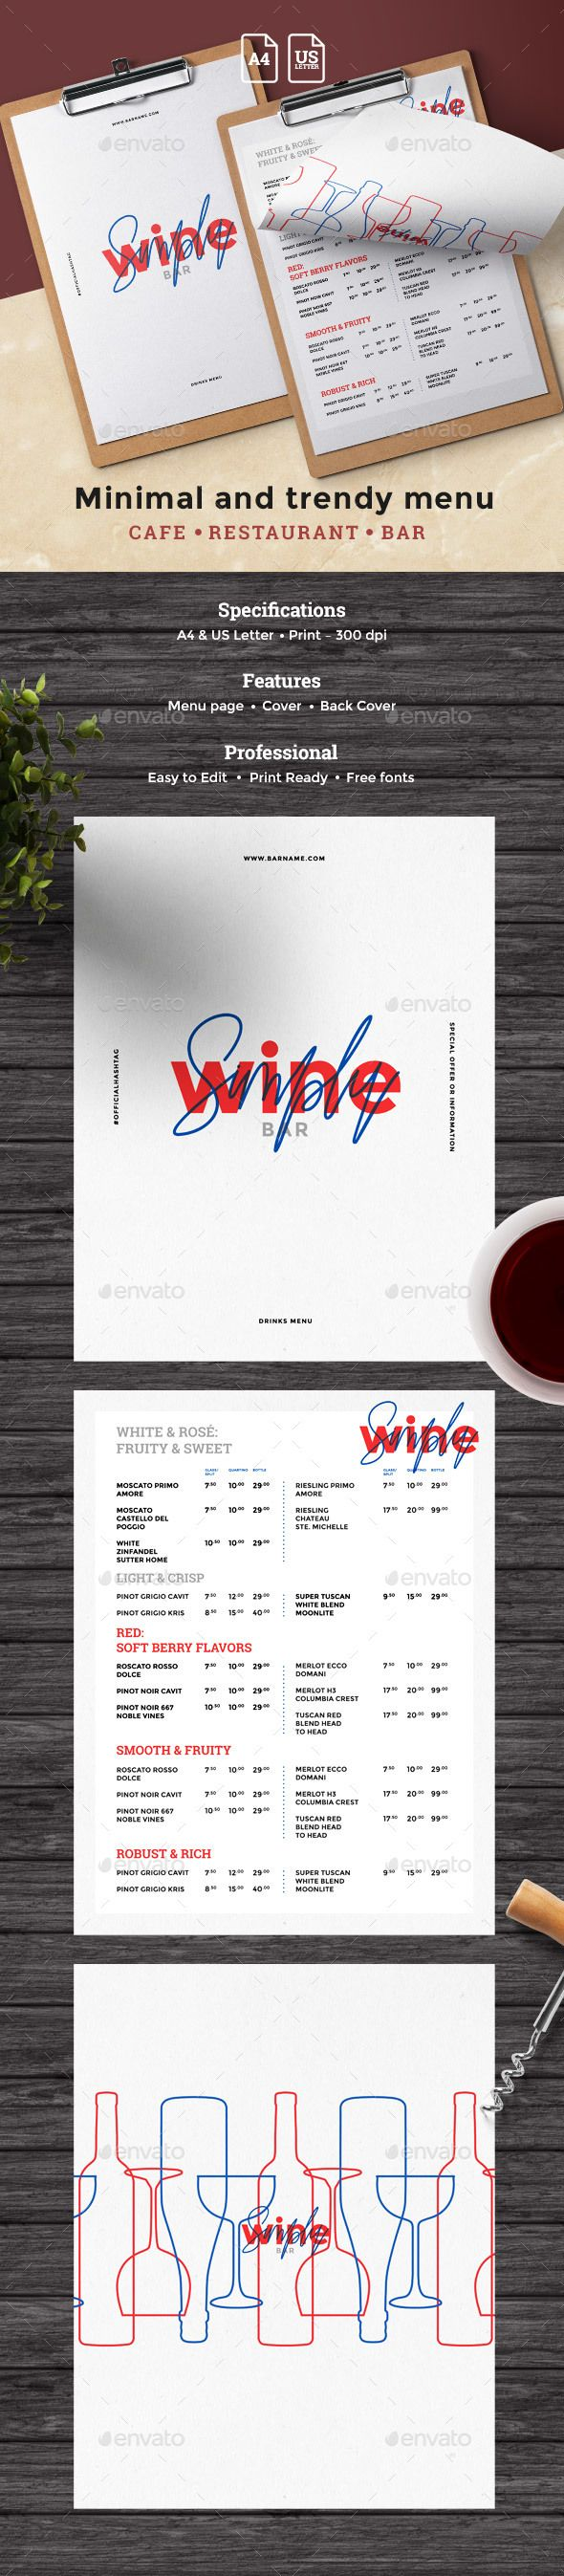 Wine Drinks Menu - #Food #Menus Print Templates Download here:  https://graphicriver.net/item/wine-drinks-menu/19608582?ref=alena994